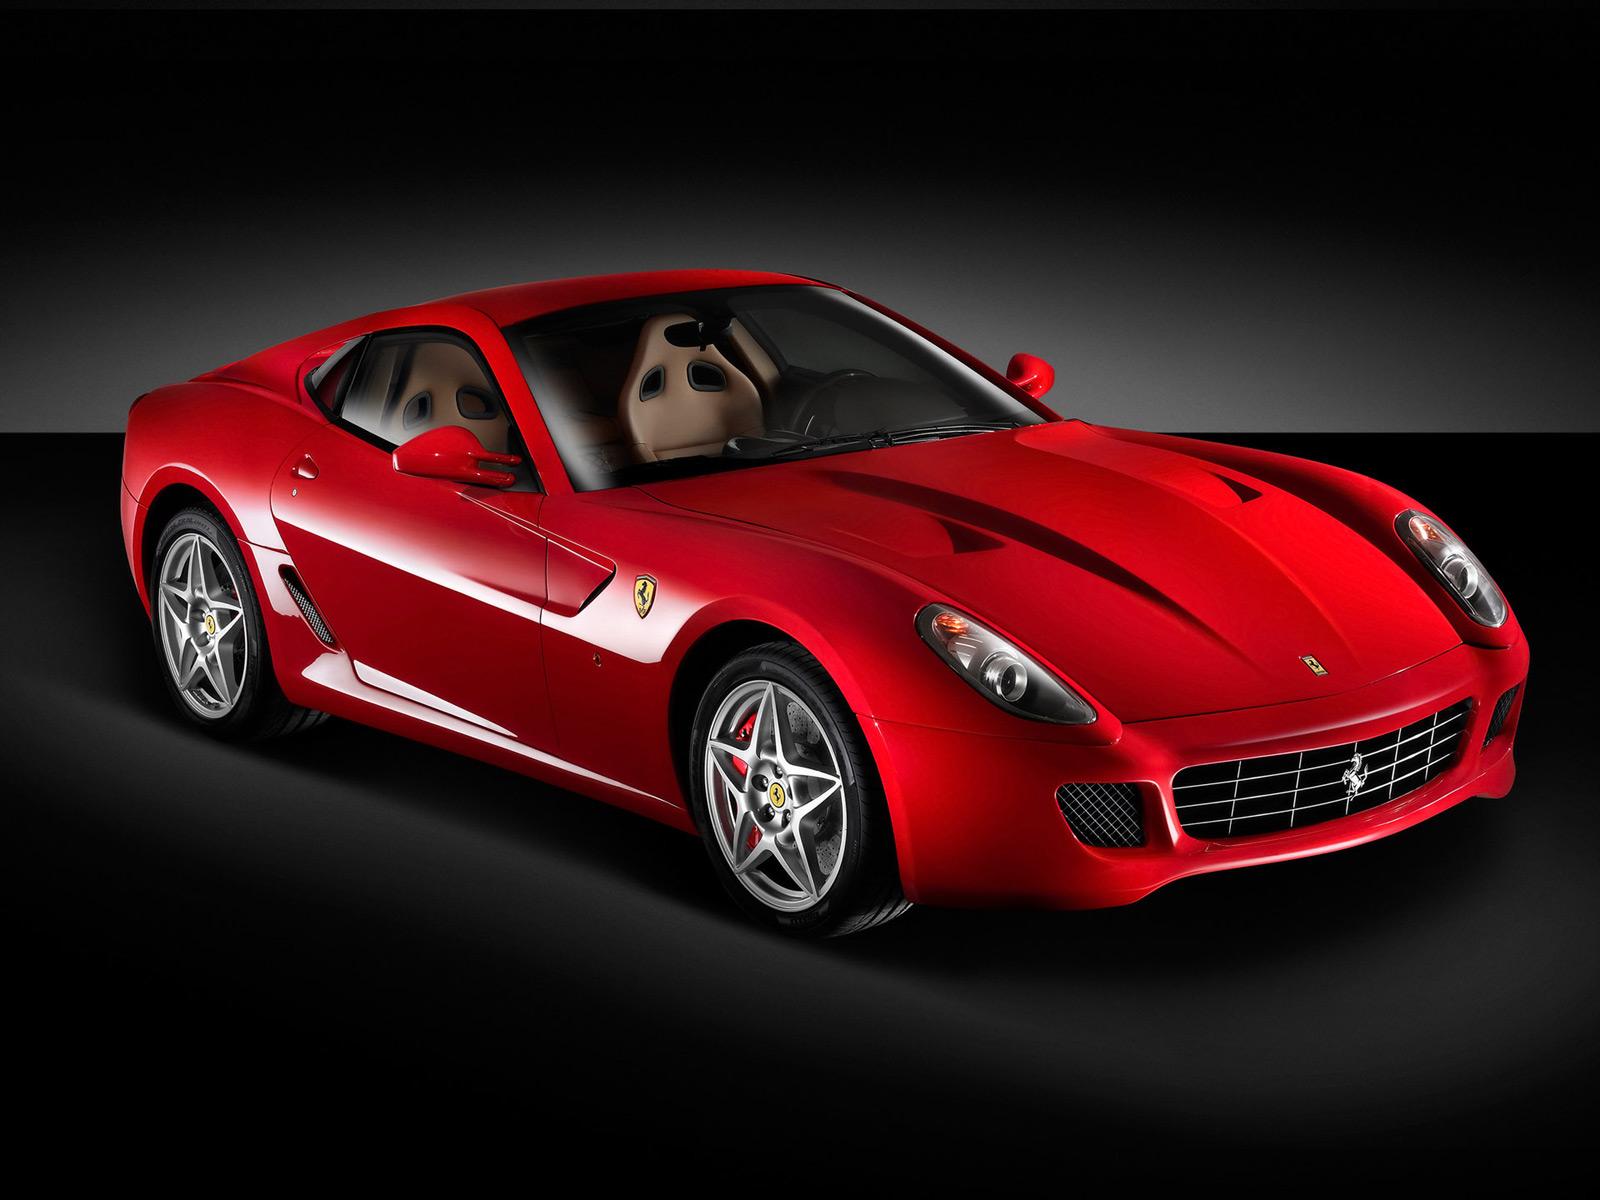 Top Cars Modif: Ferrari 599 GTB Pictures